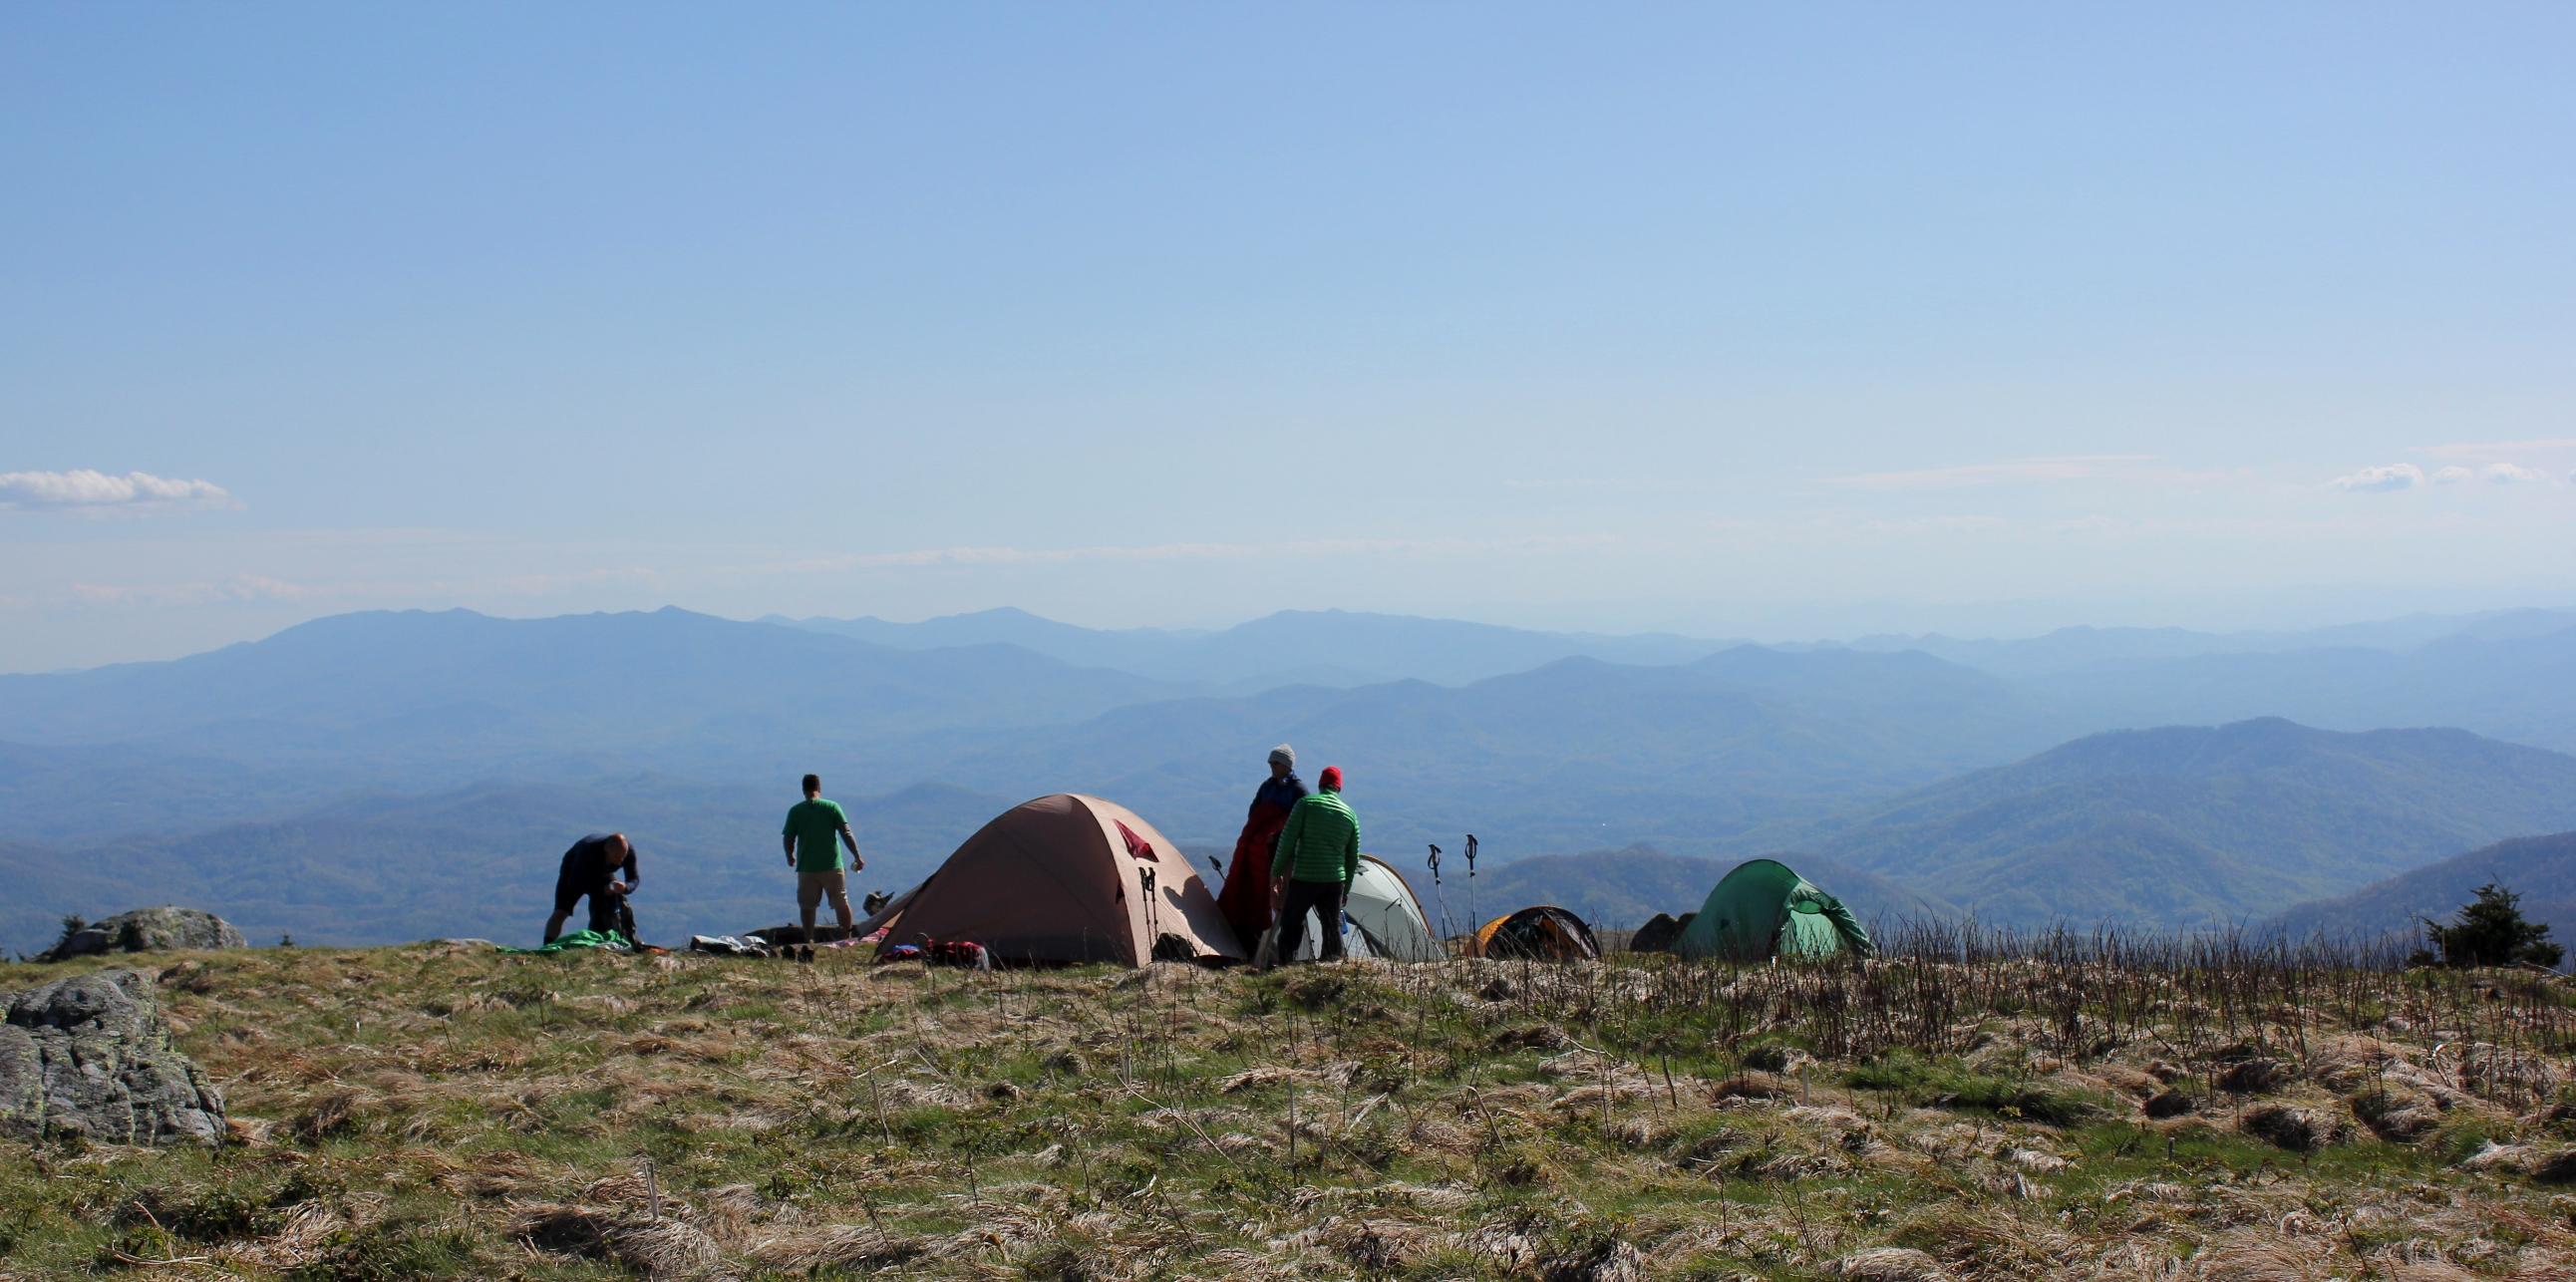 Camping on Grassy Ridge Bald, 6165'